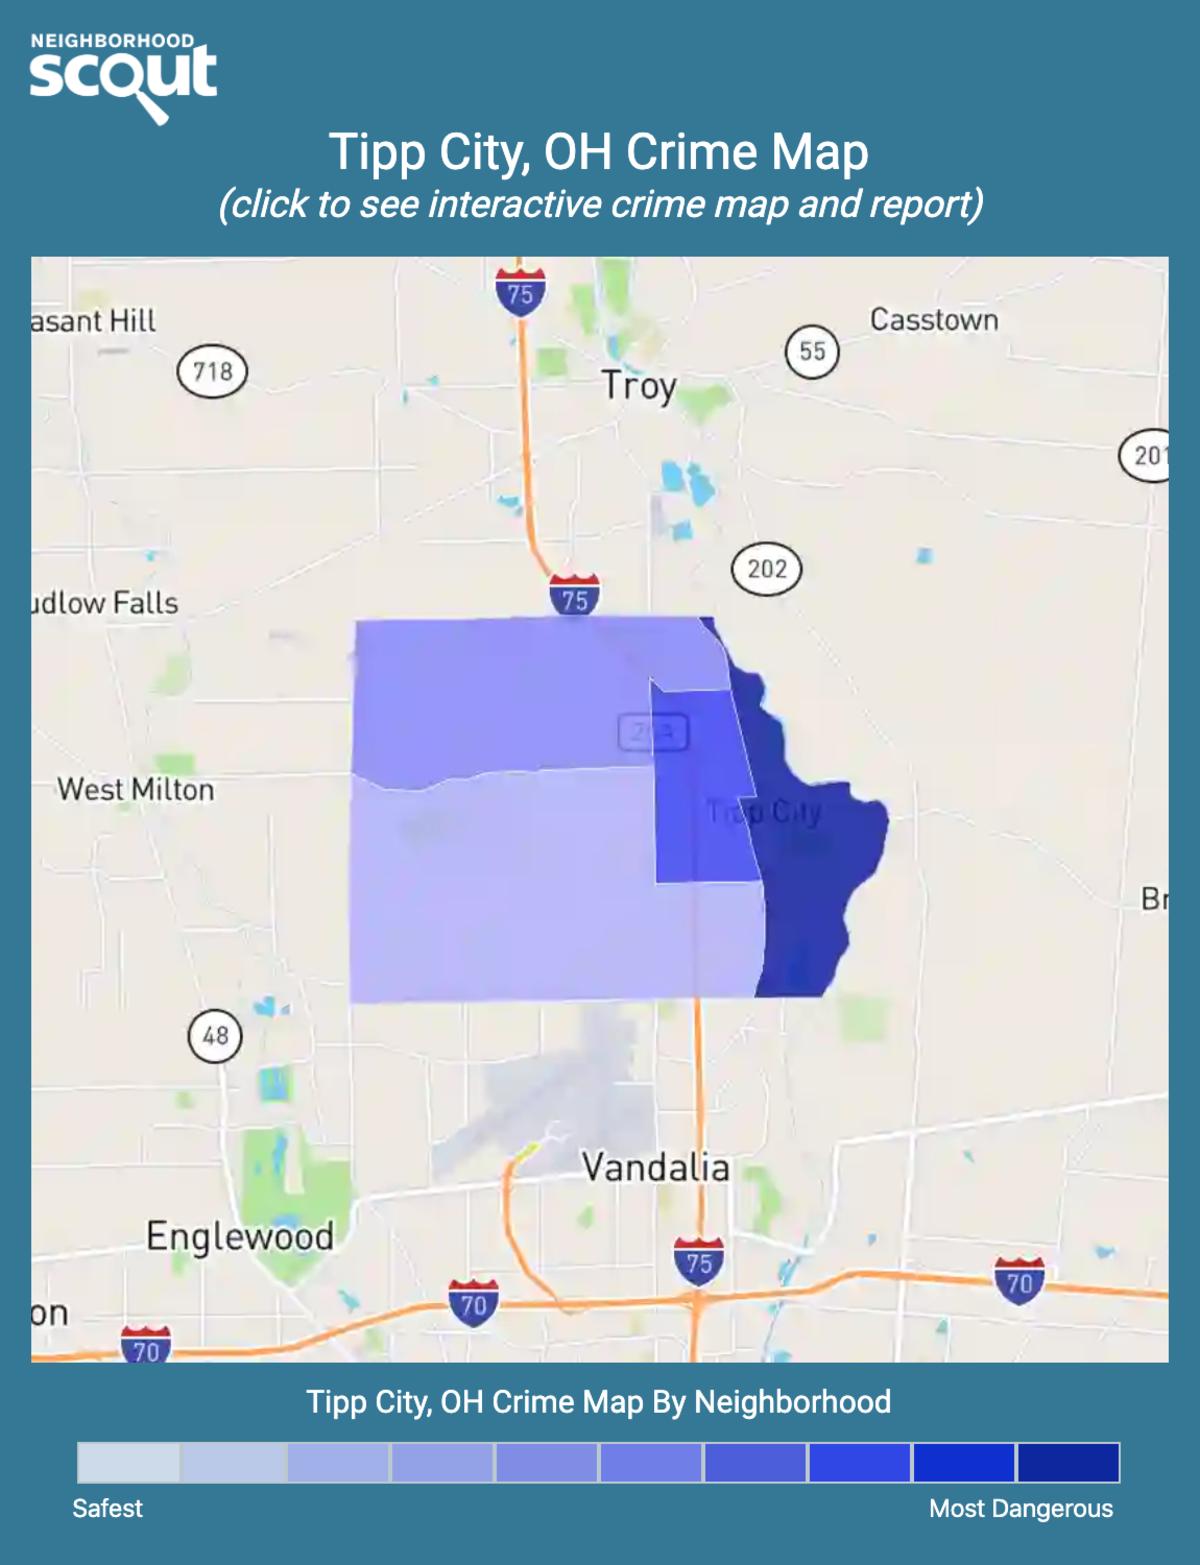 Tipp City, Ohio crime map